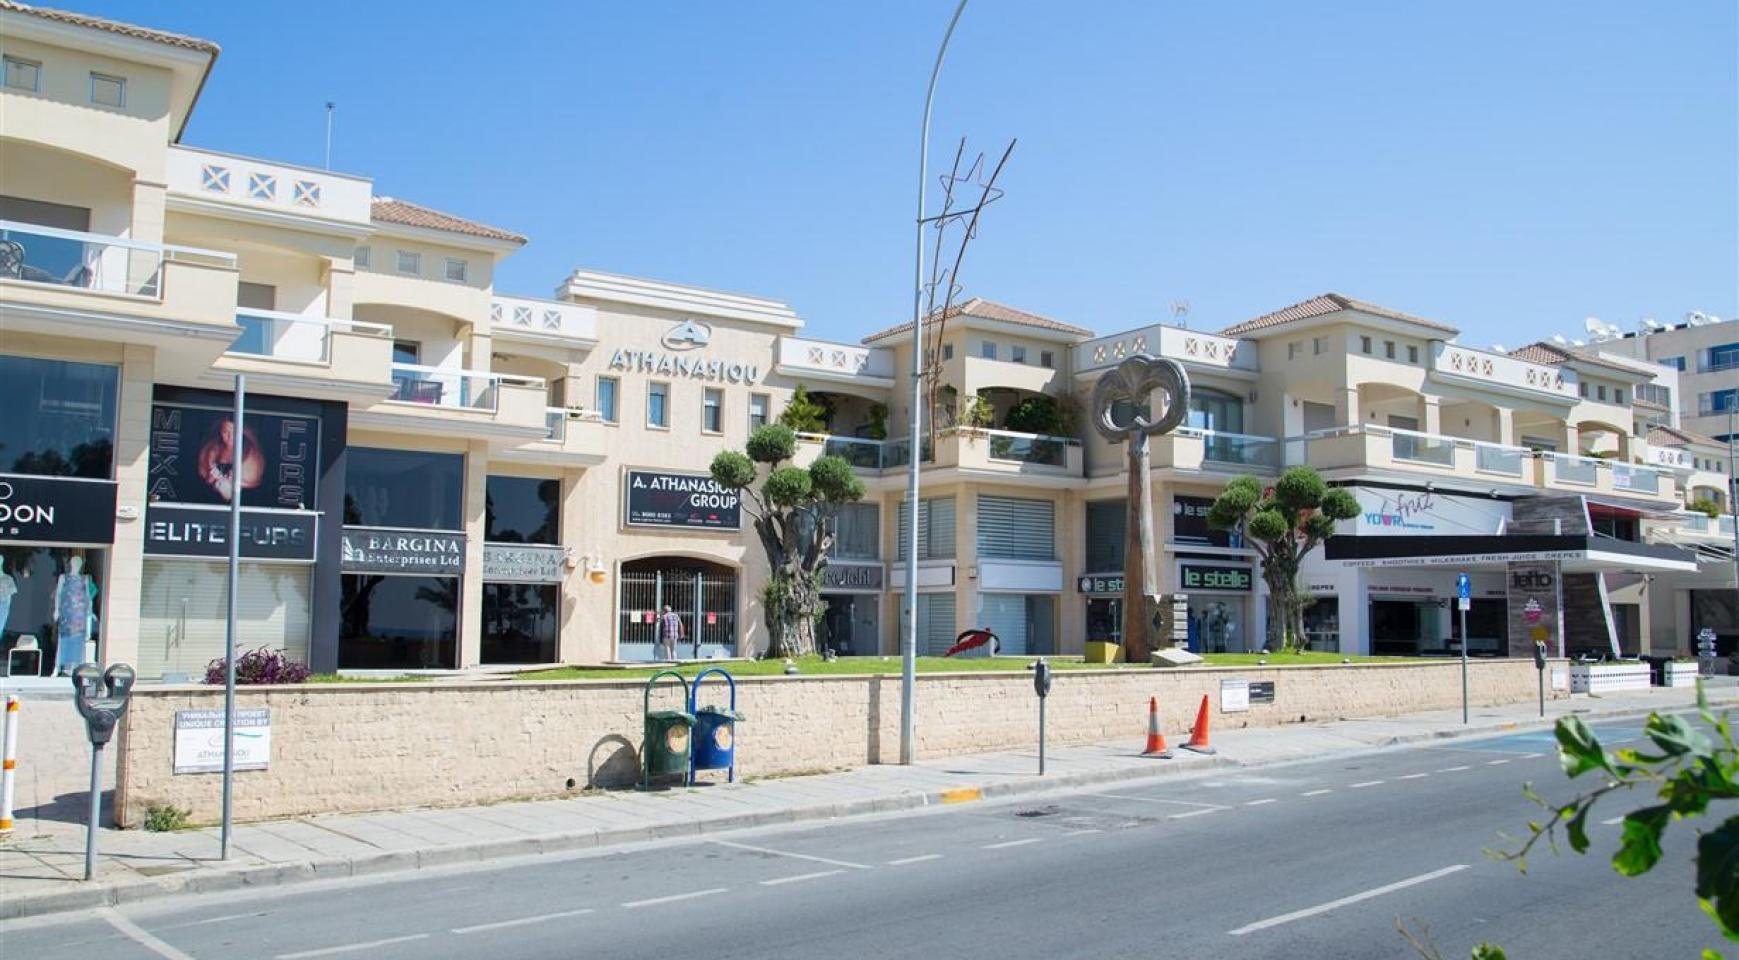 Luxury 2 Bedroom Apartment Mesogios Iris 304 in the Tourist area near the Beach - 41